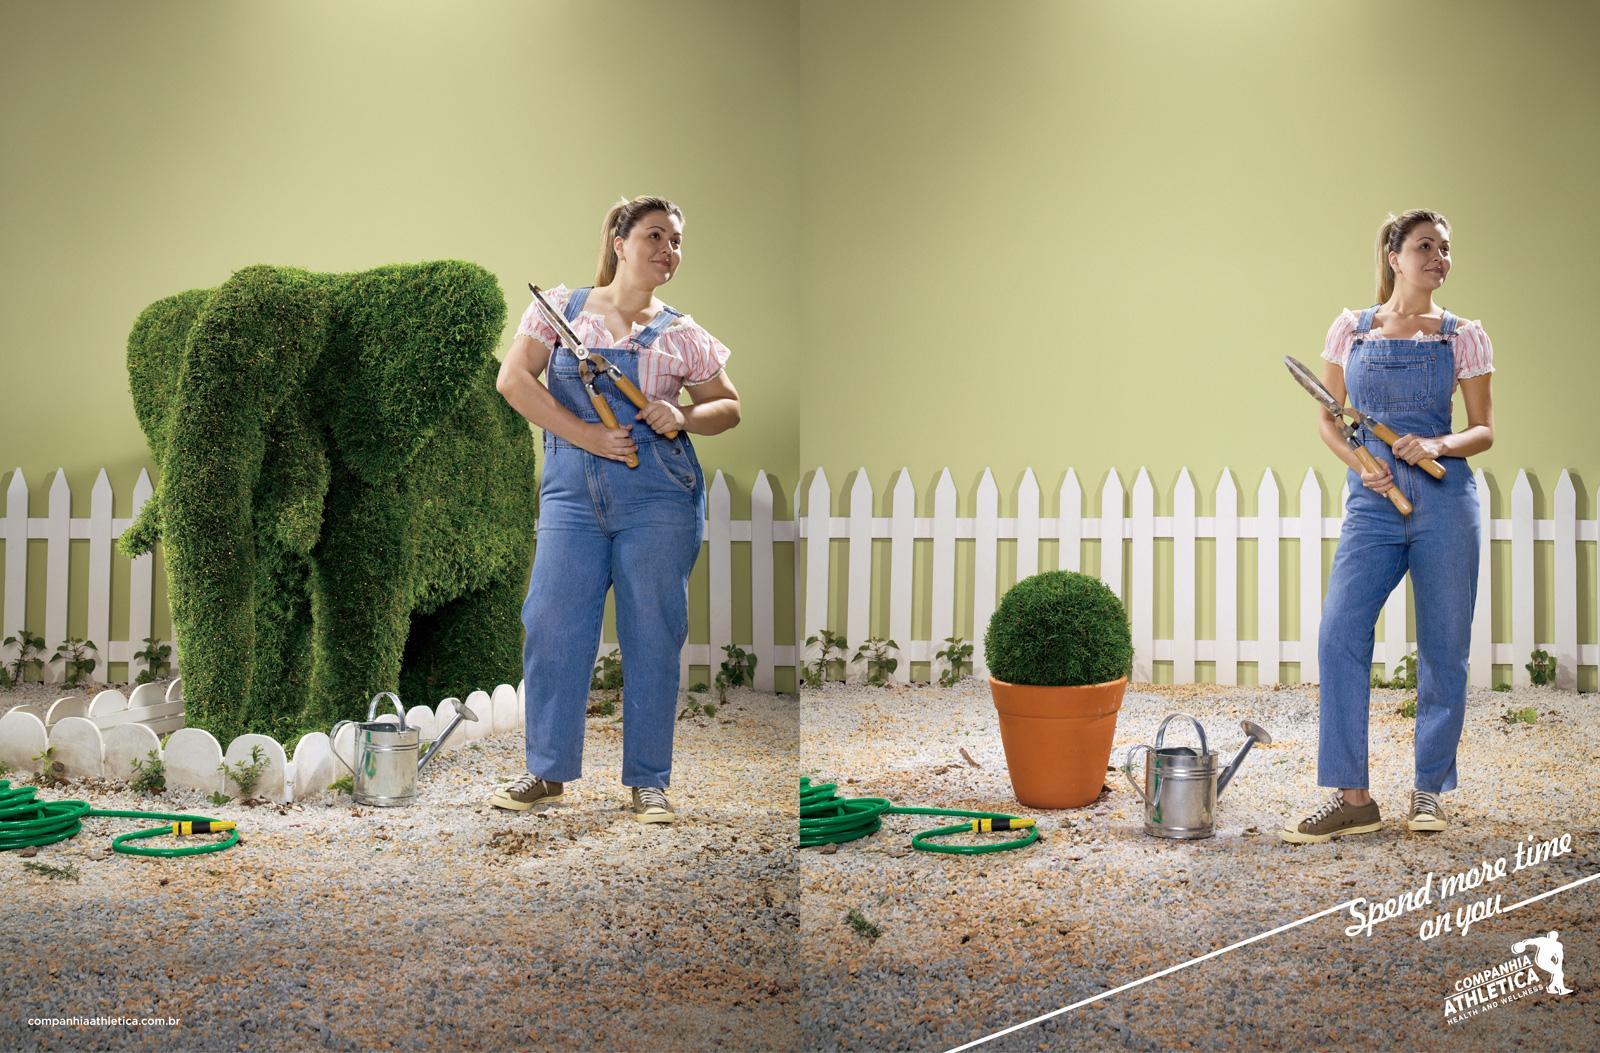 Companhia Athletica Print Ad   Gardening